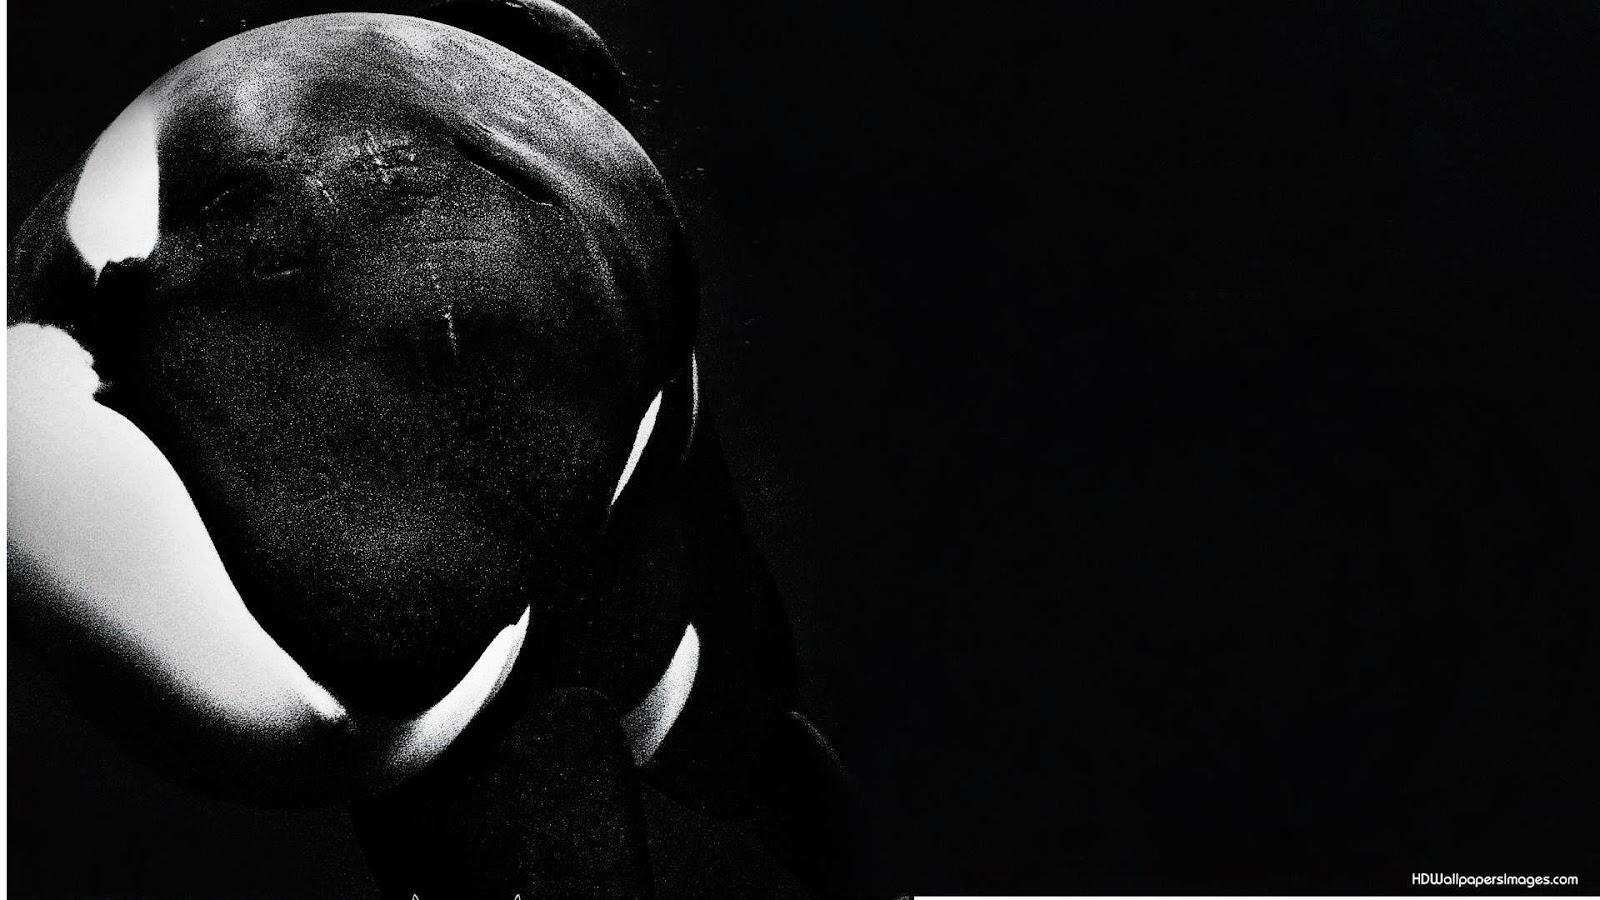 Burpelson Airforce Base Blackfish 1600x900